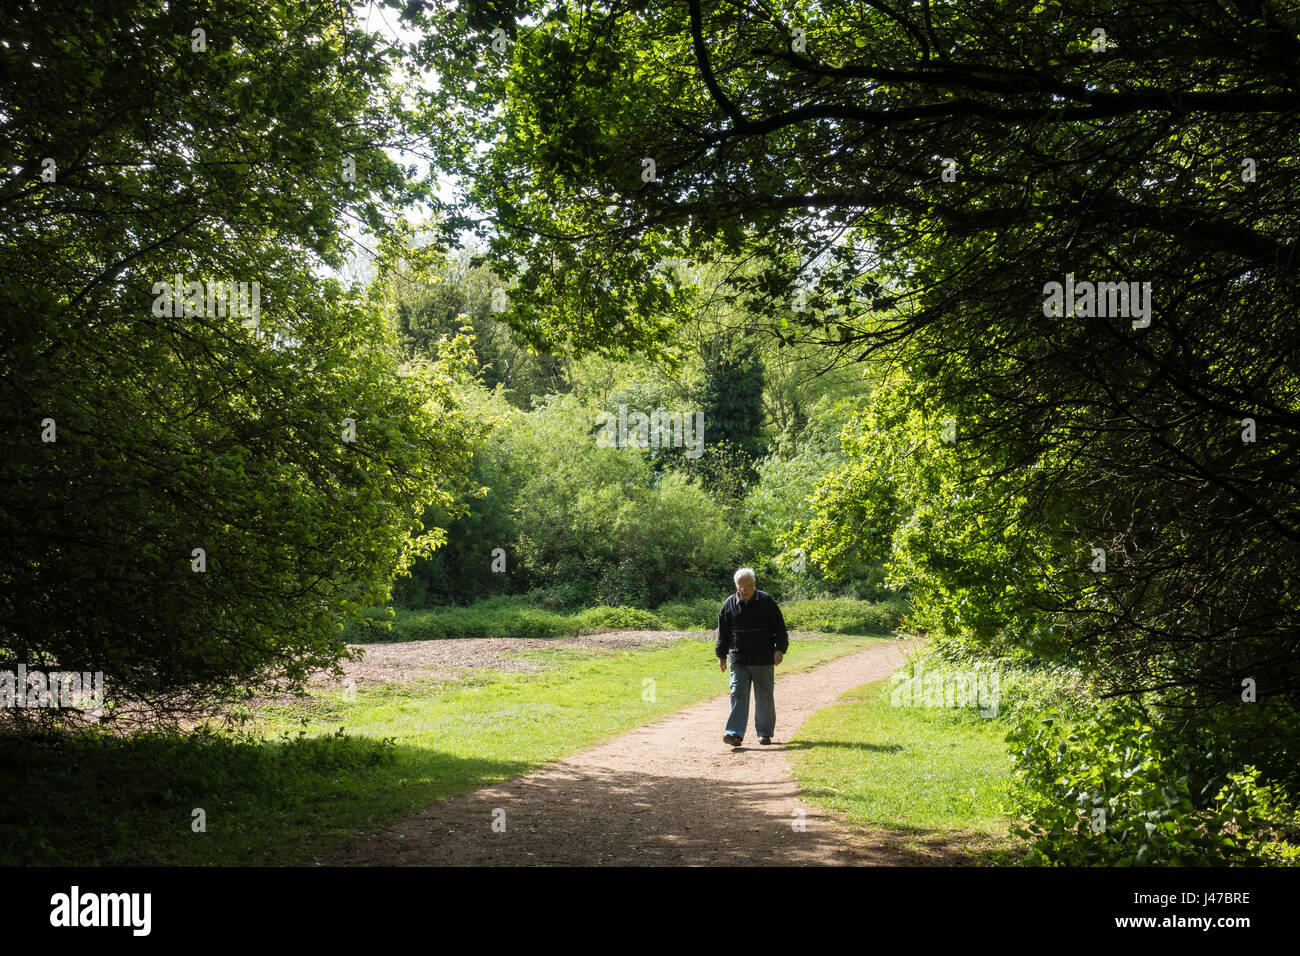 a-walk-in-the-park-J47BRE.jpg